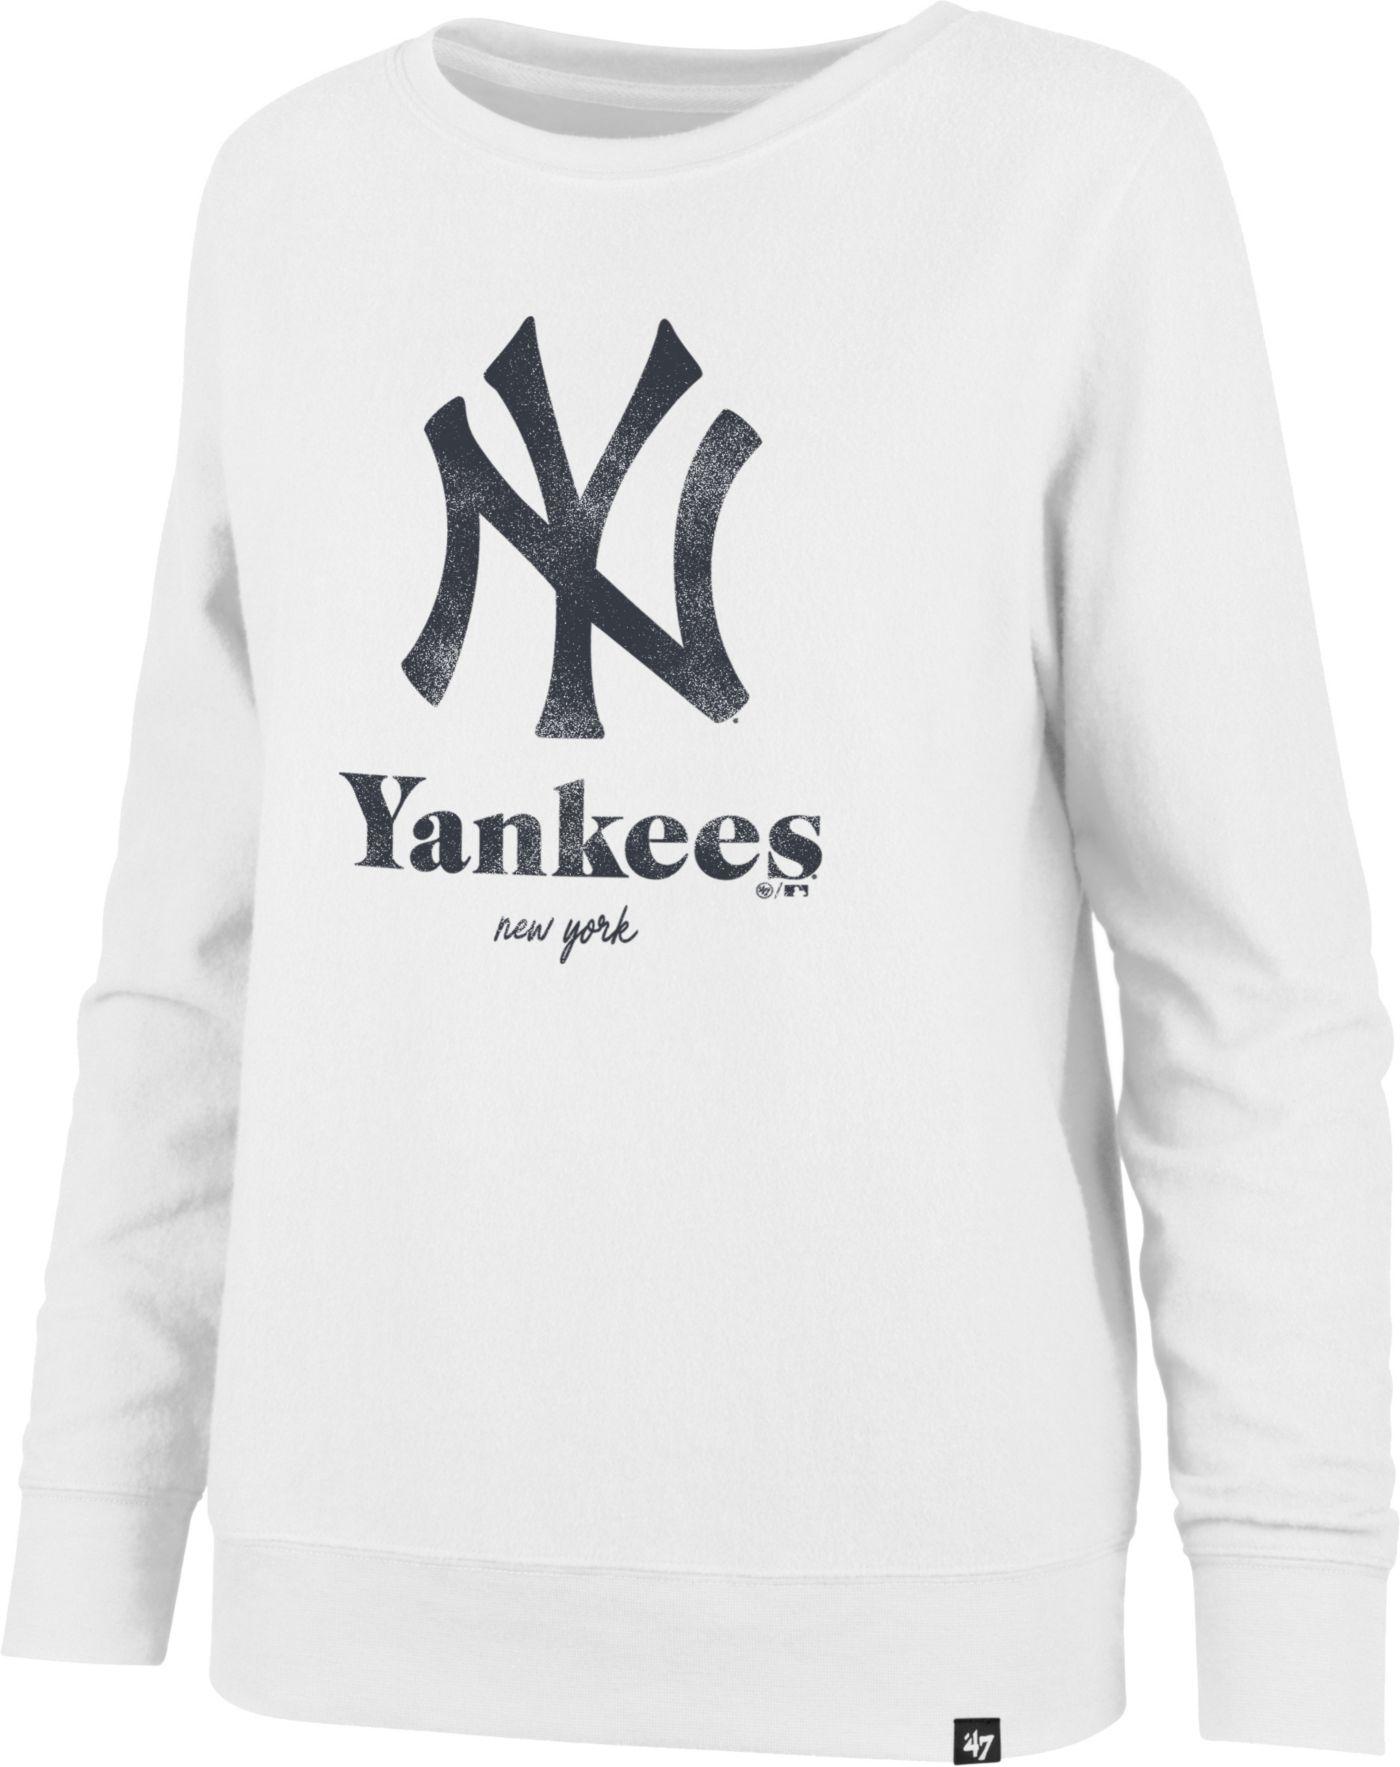 '47 Women's New York Yankees Throwback Fleece Crew